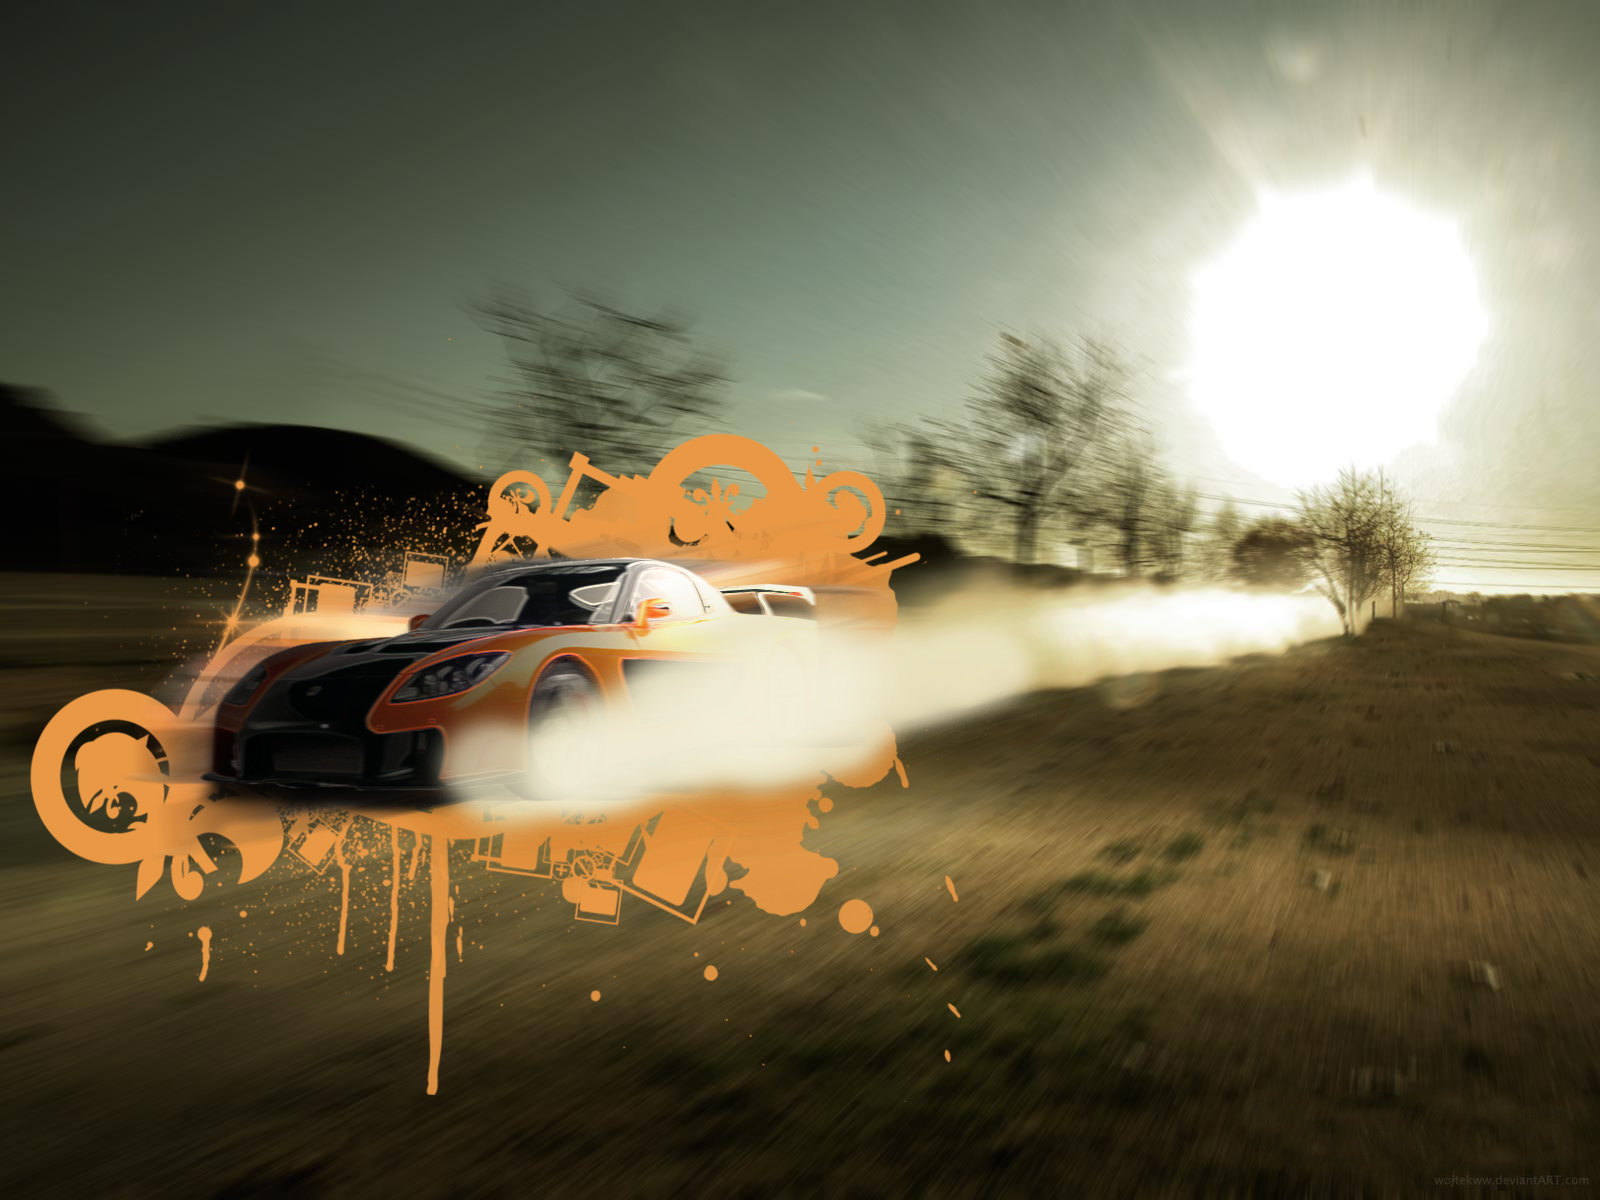 Mazda RX 7 Fast n Furious Wall by wojtekww 1600x1200